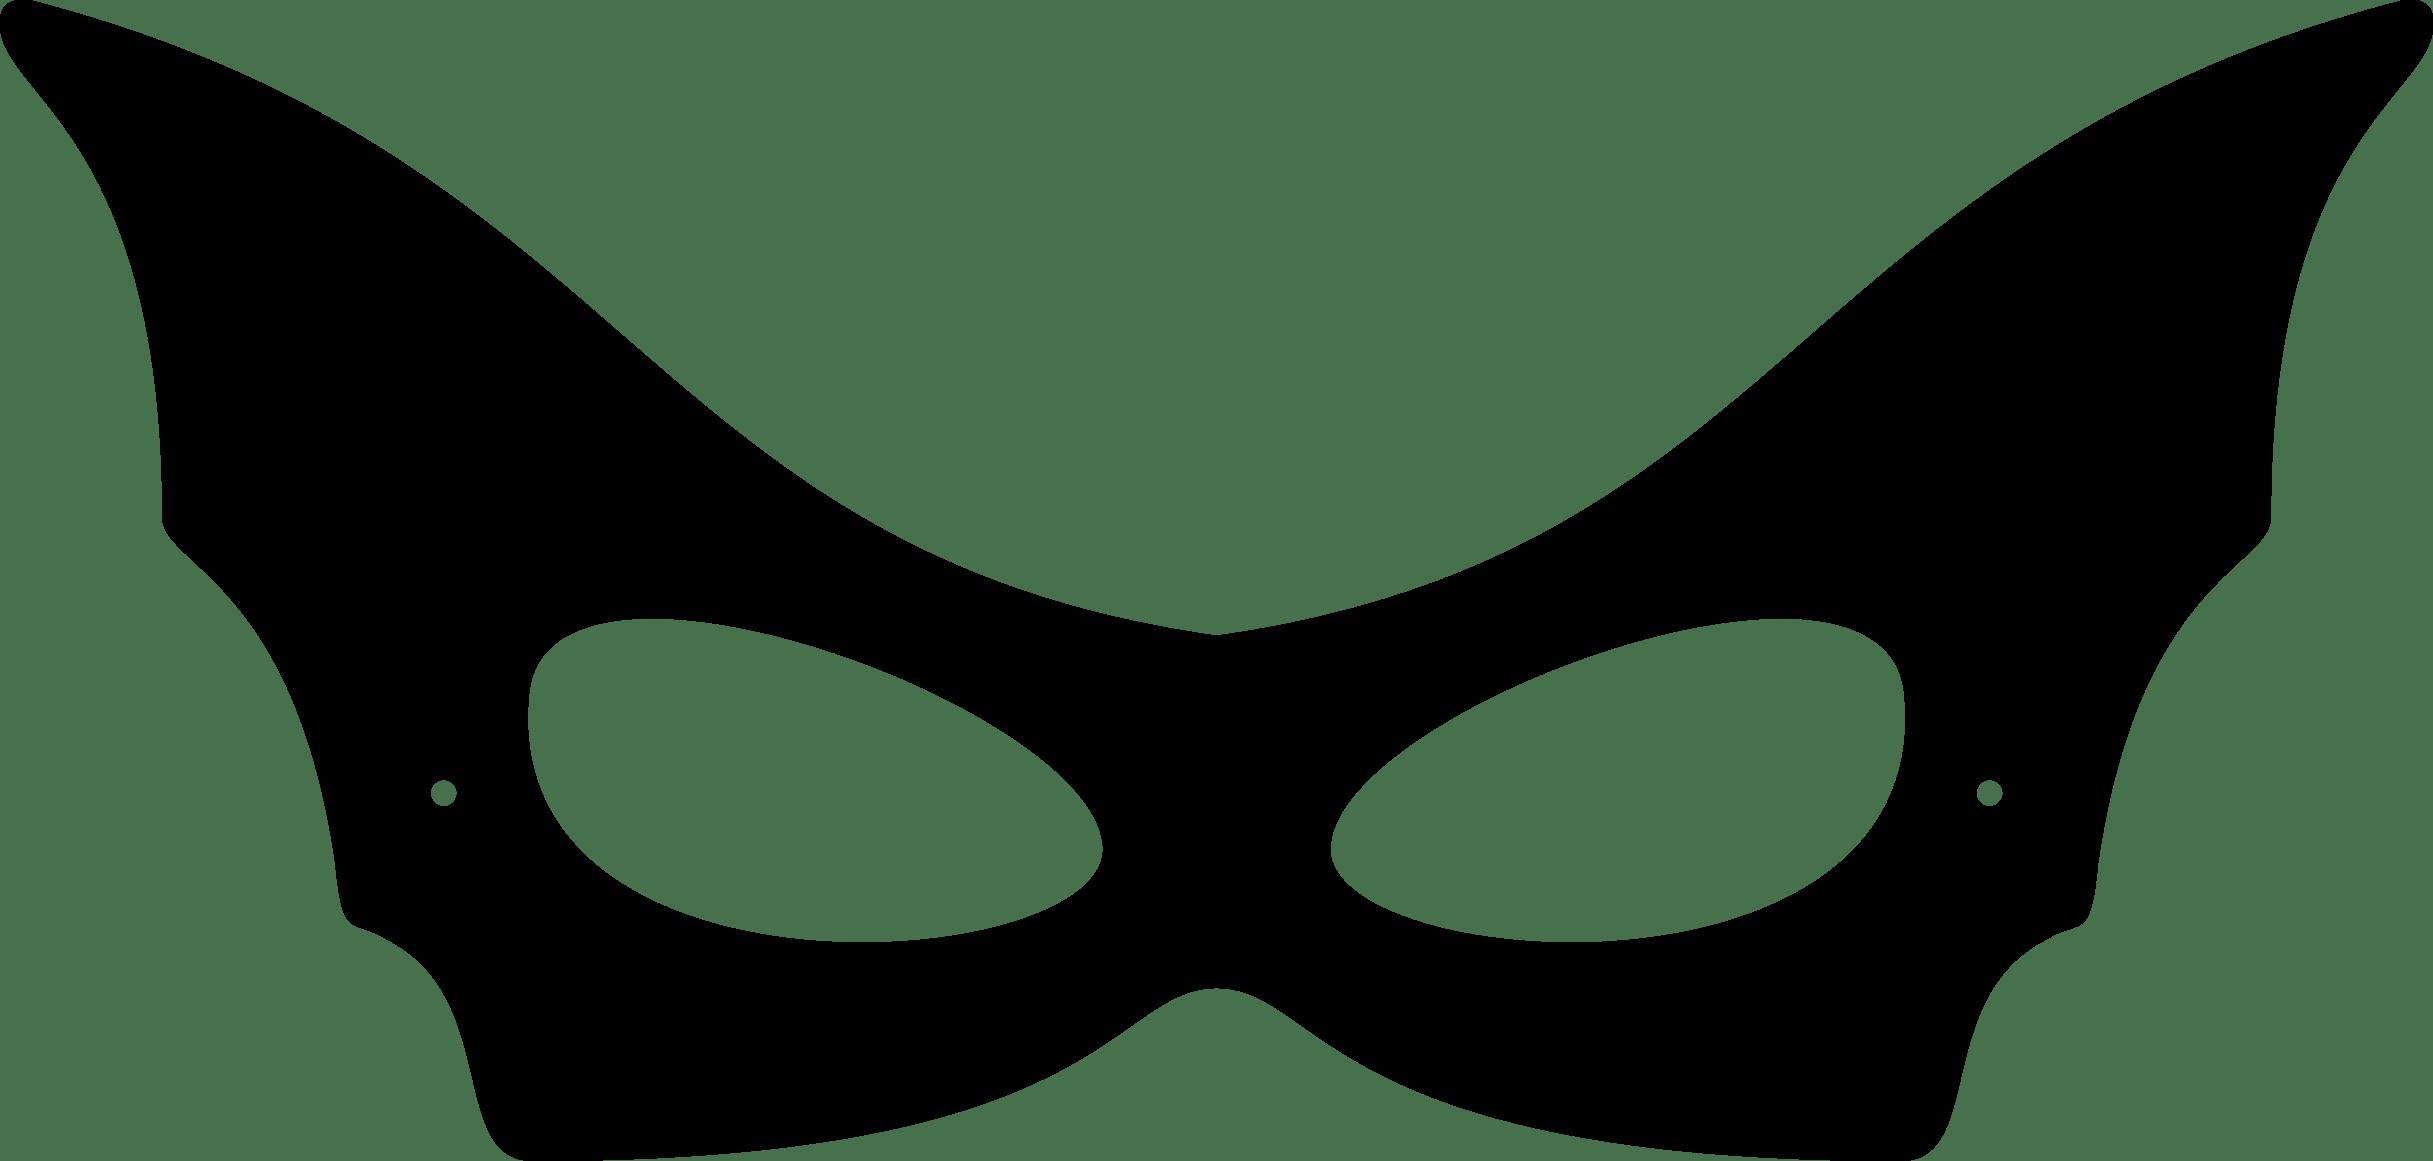 Mask clipart cat woman. Catwoman template costumepartyrun black